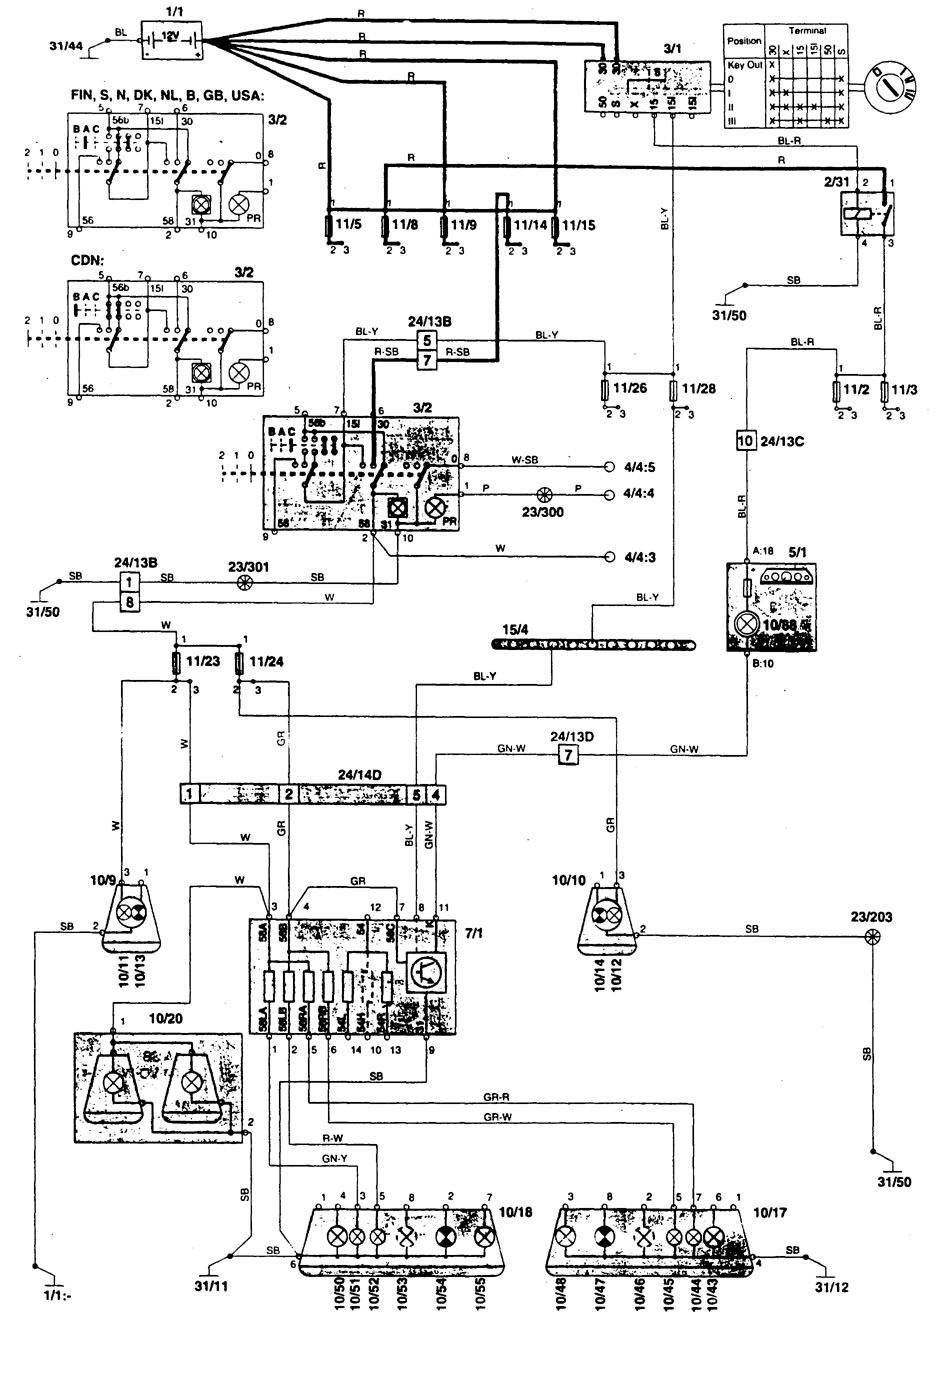 medium resolution of volvo 850 tail light wiring library wiring diagramvolvo tail light wiring diagram wiring library saab 9